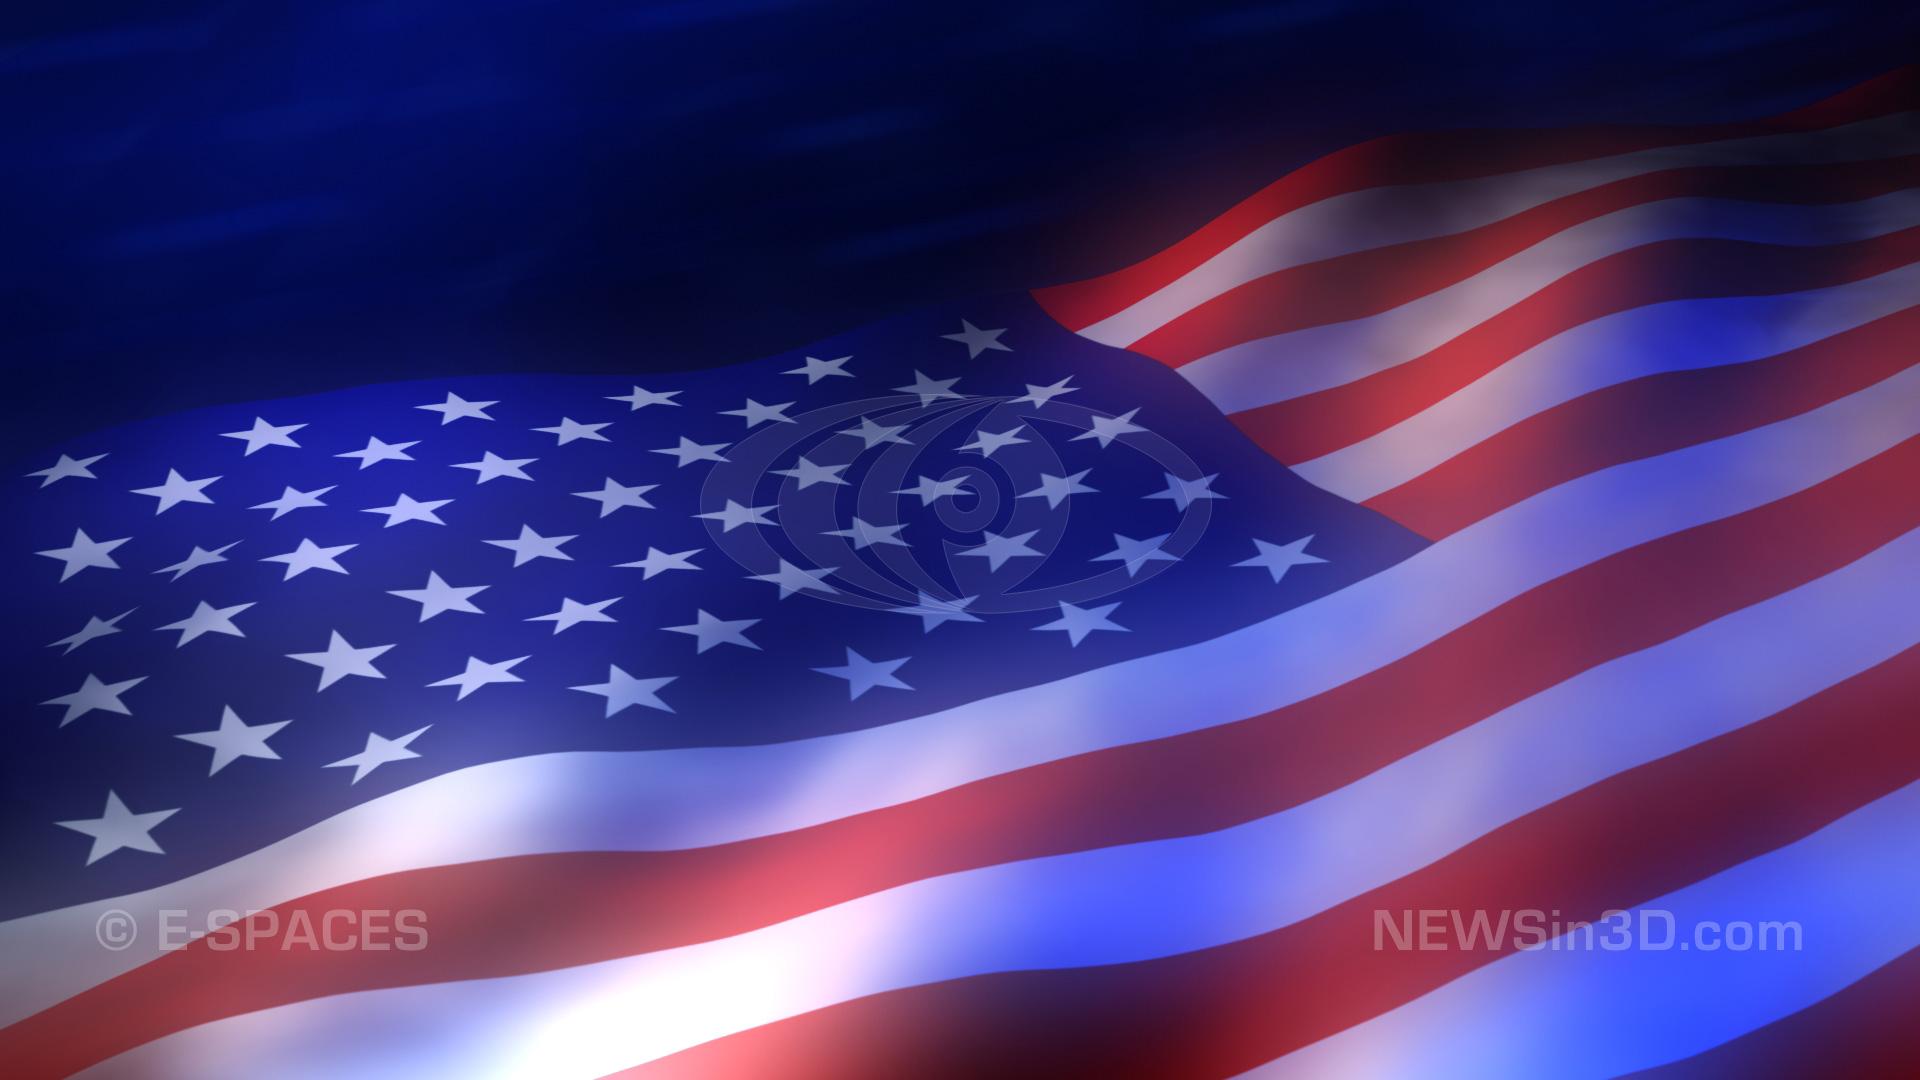 active desktop wallpaper american flag 1920x1080